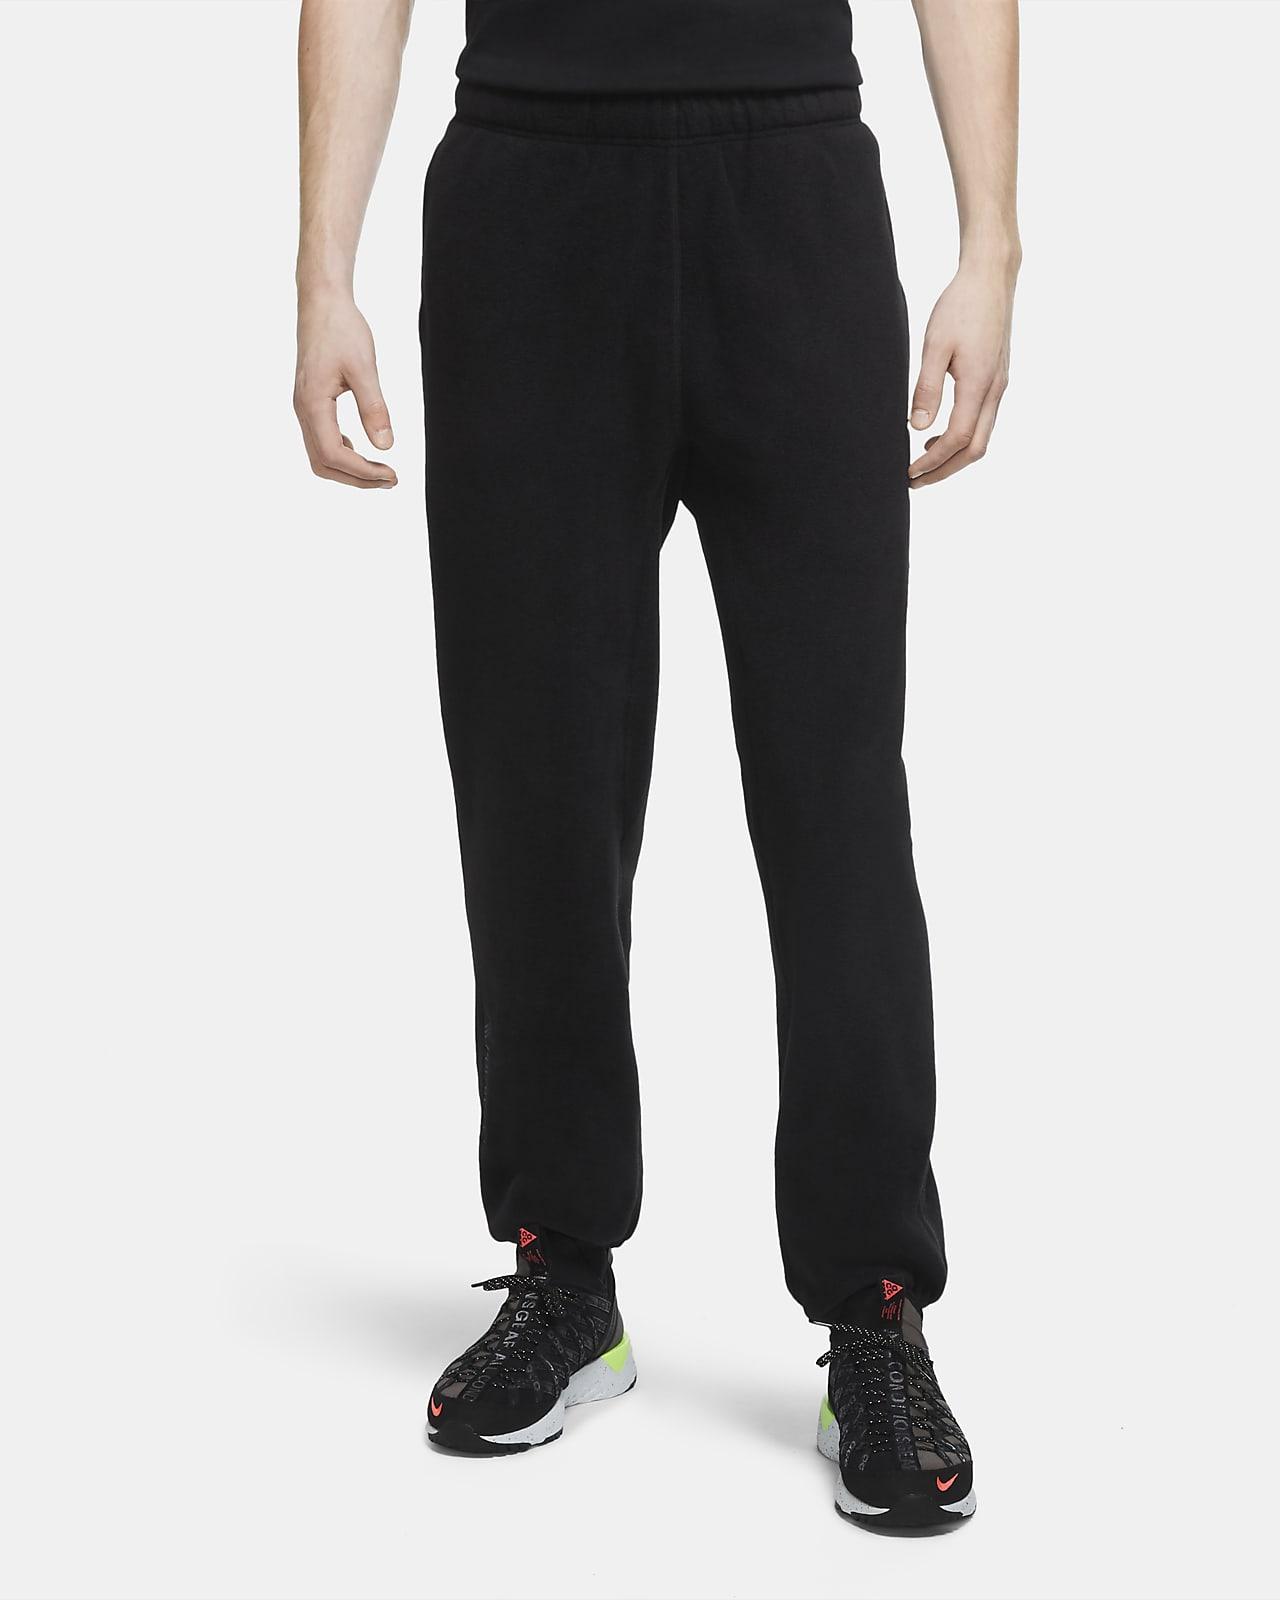 Nike ACG Polartec® 'Wolf Tree' Men's Trousers